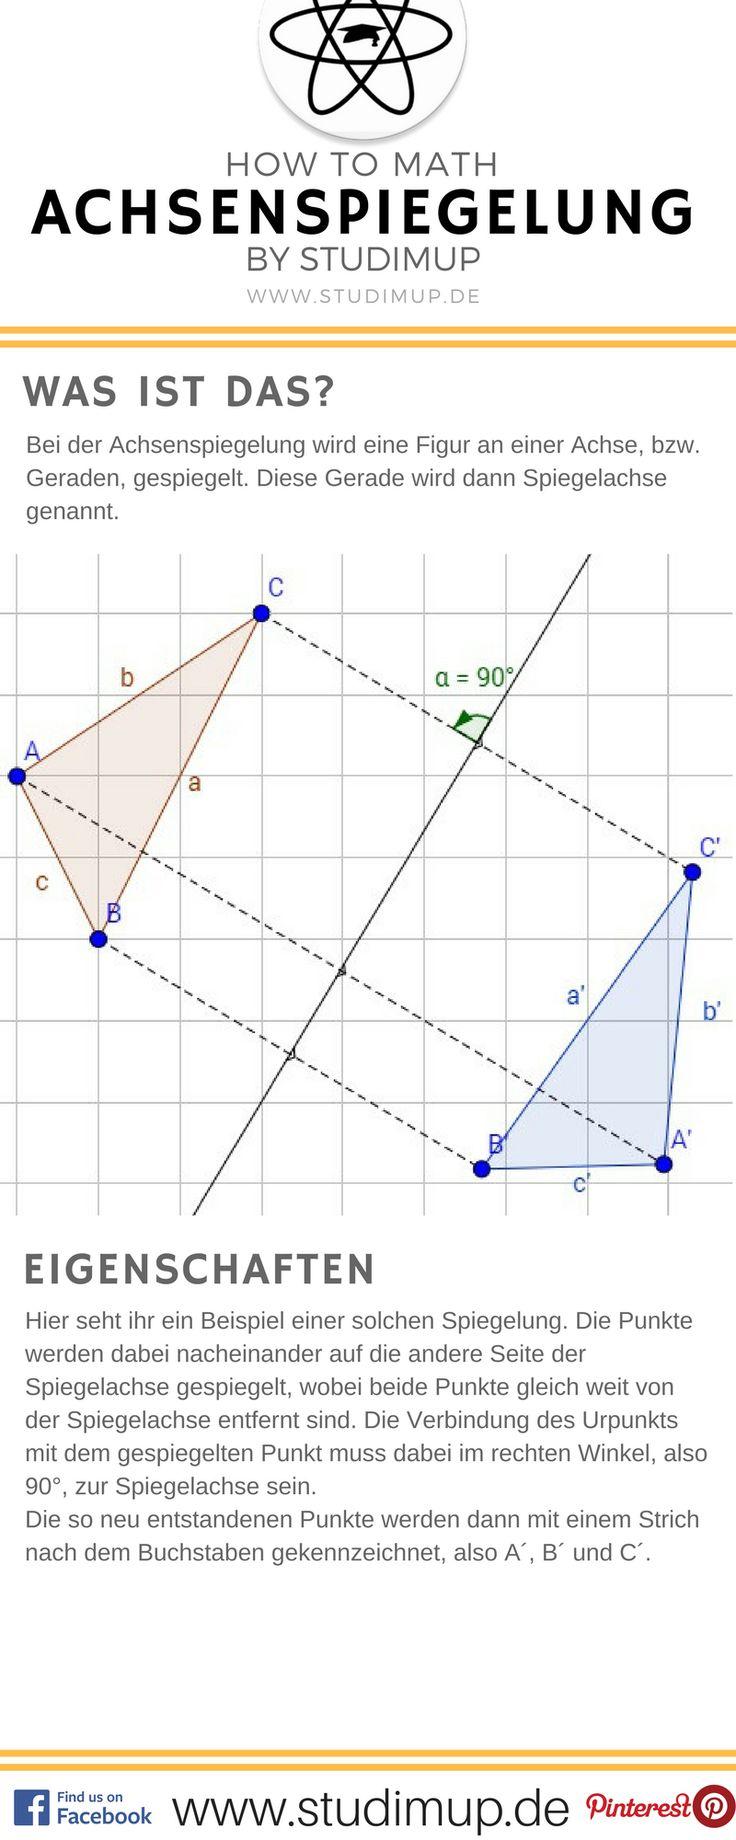 Tolle Bisect Winkel Arbeitsblatt Galerie - Super Lehrer ...